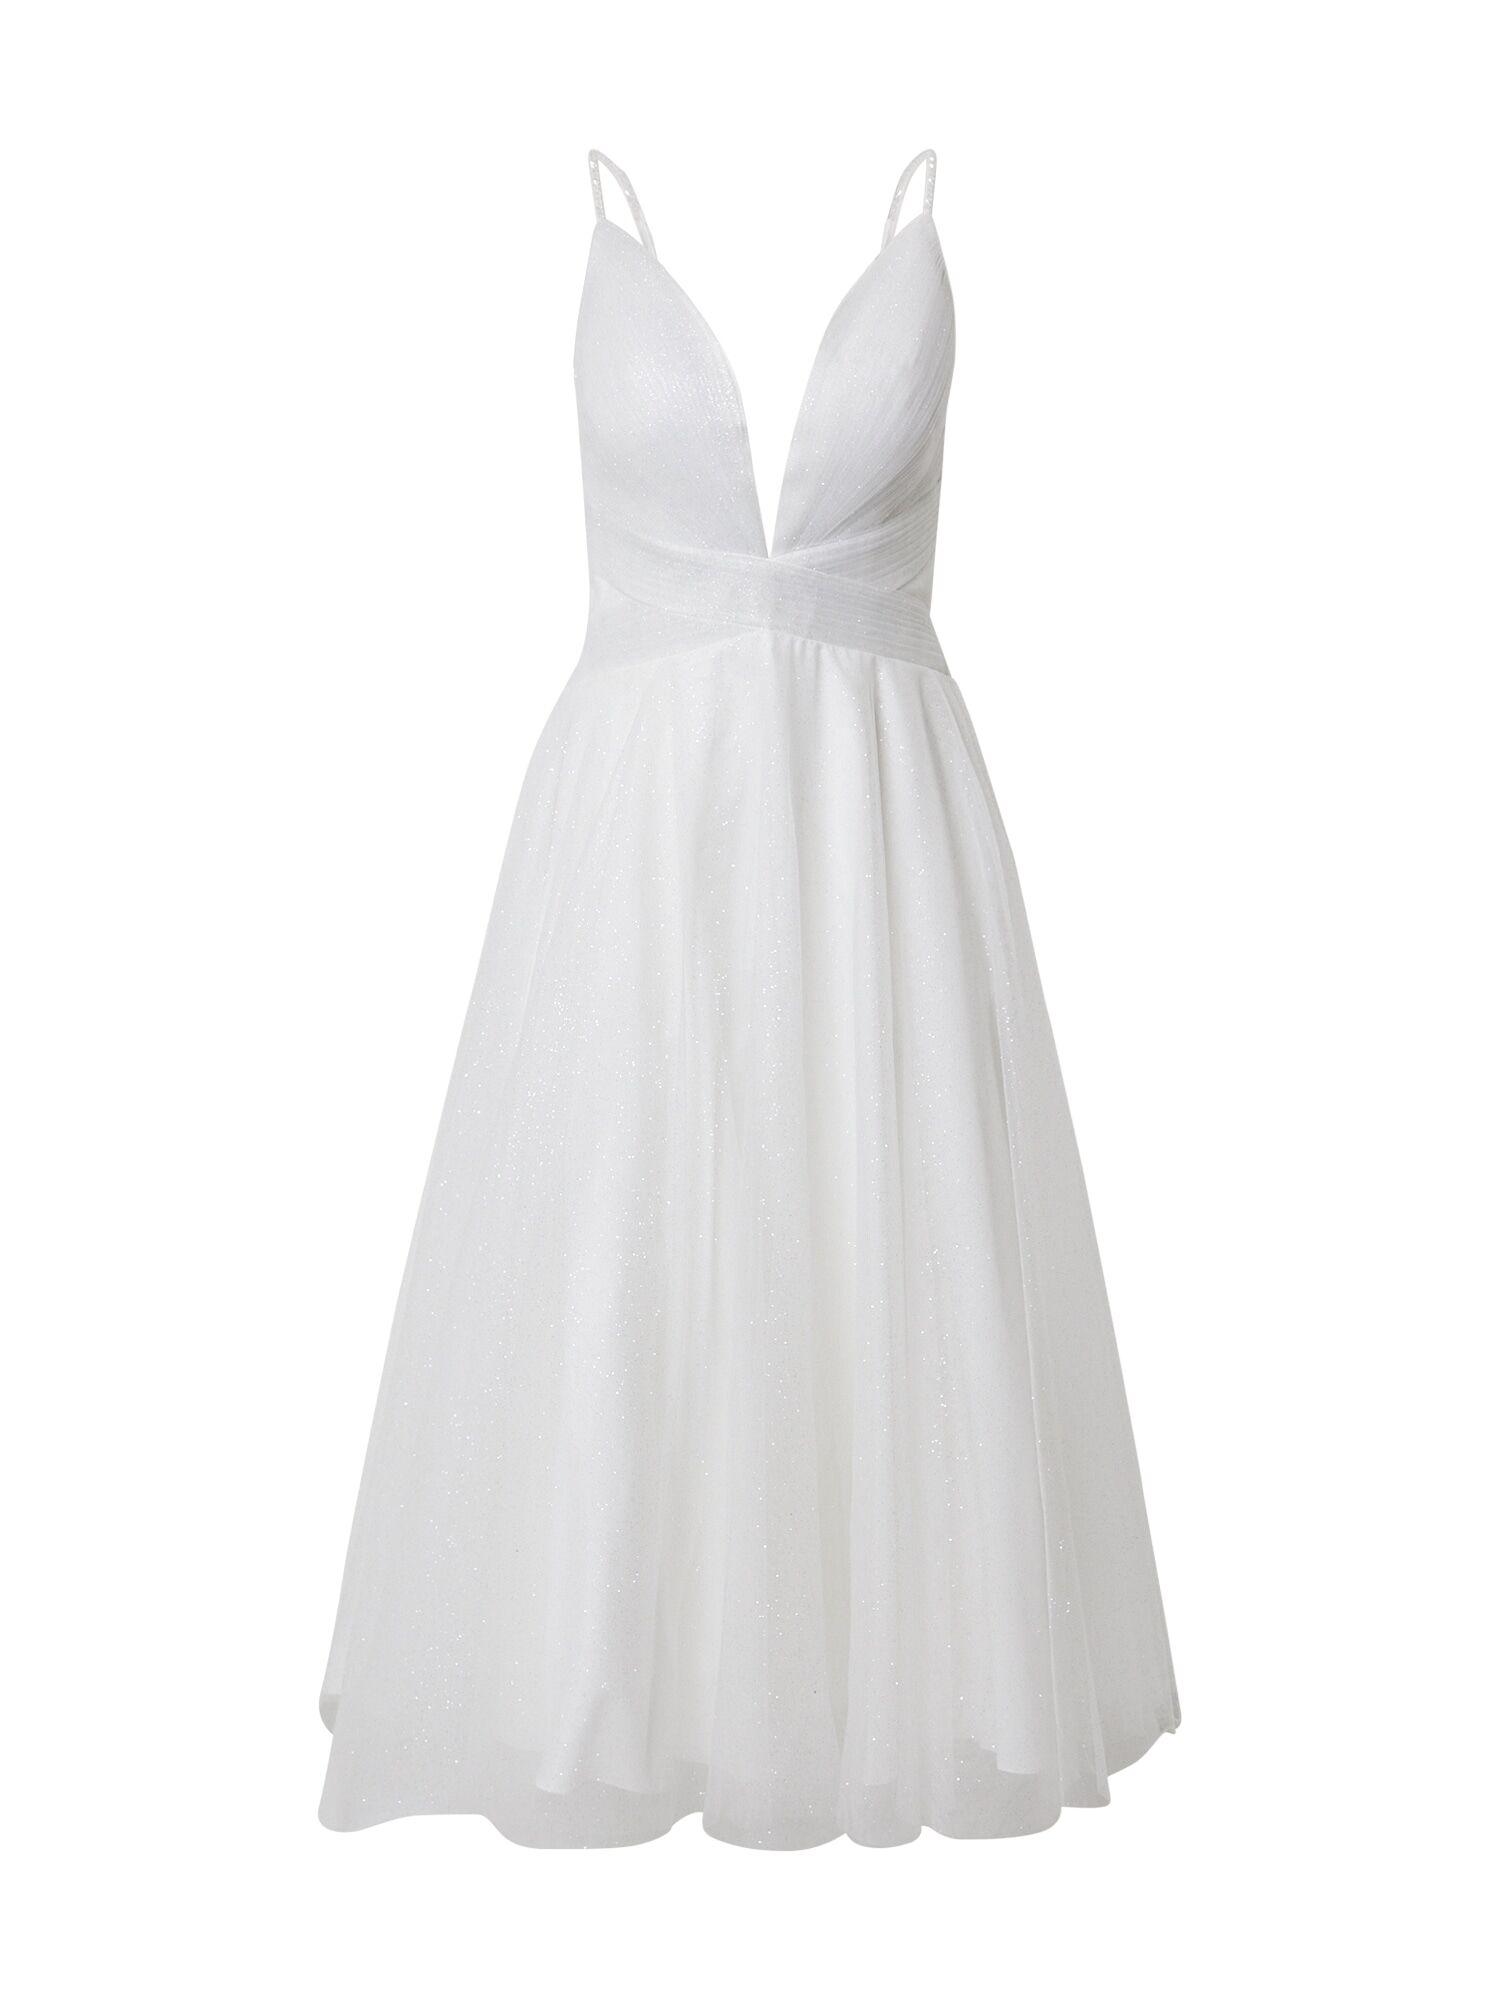 mascara Robe de soirée  - Blanc - Taille: 40 - female